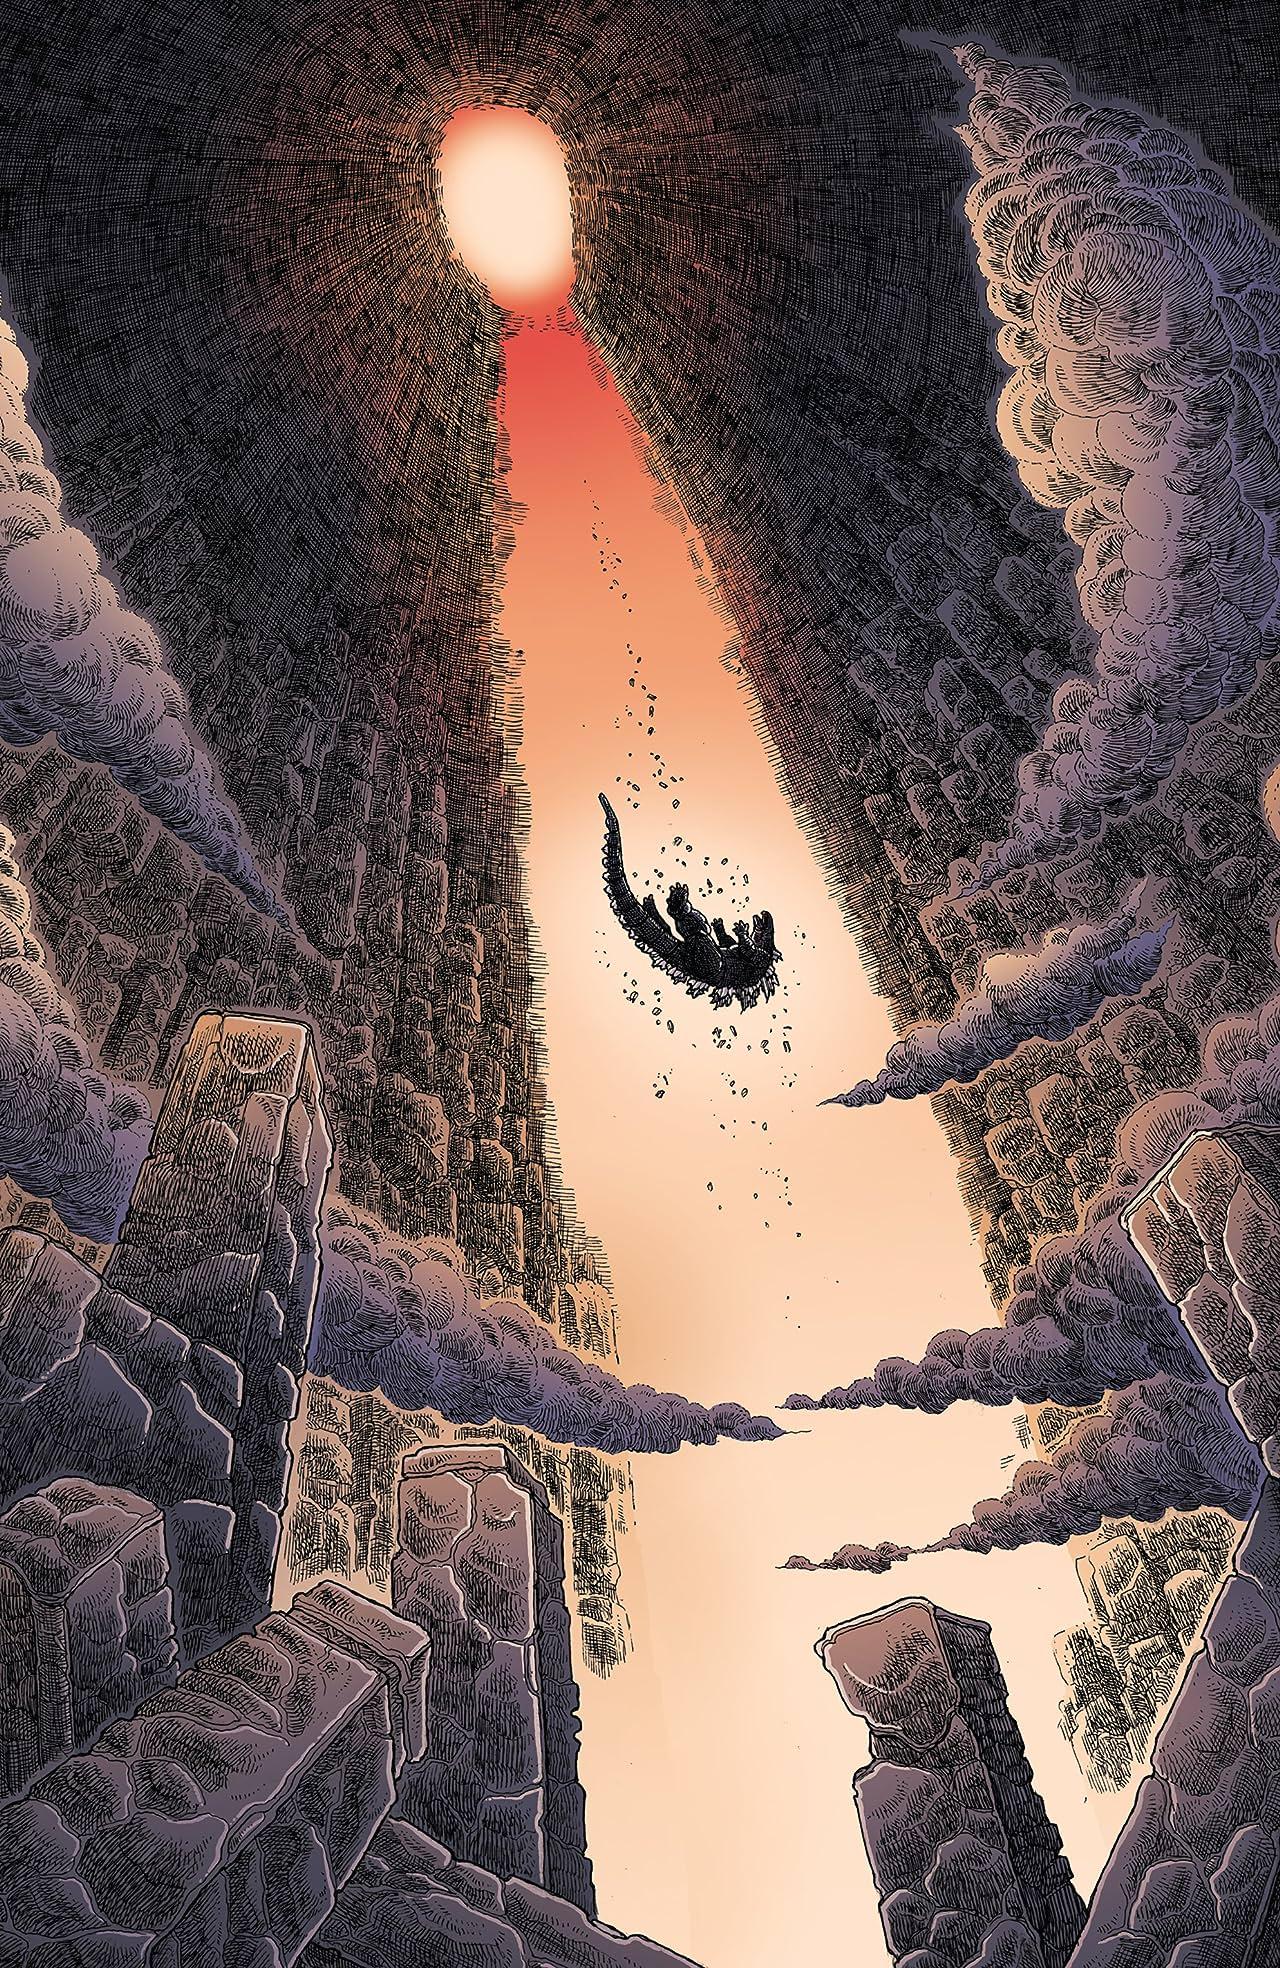 Godzilla In Hell #1 (of 5)